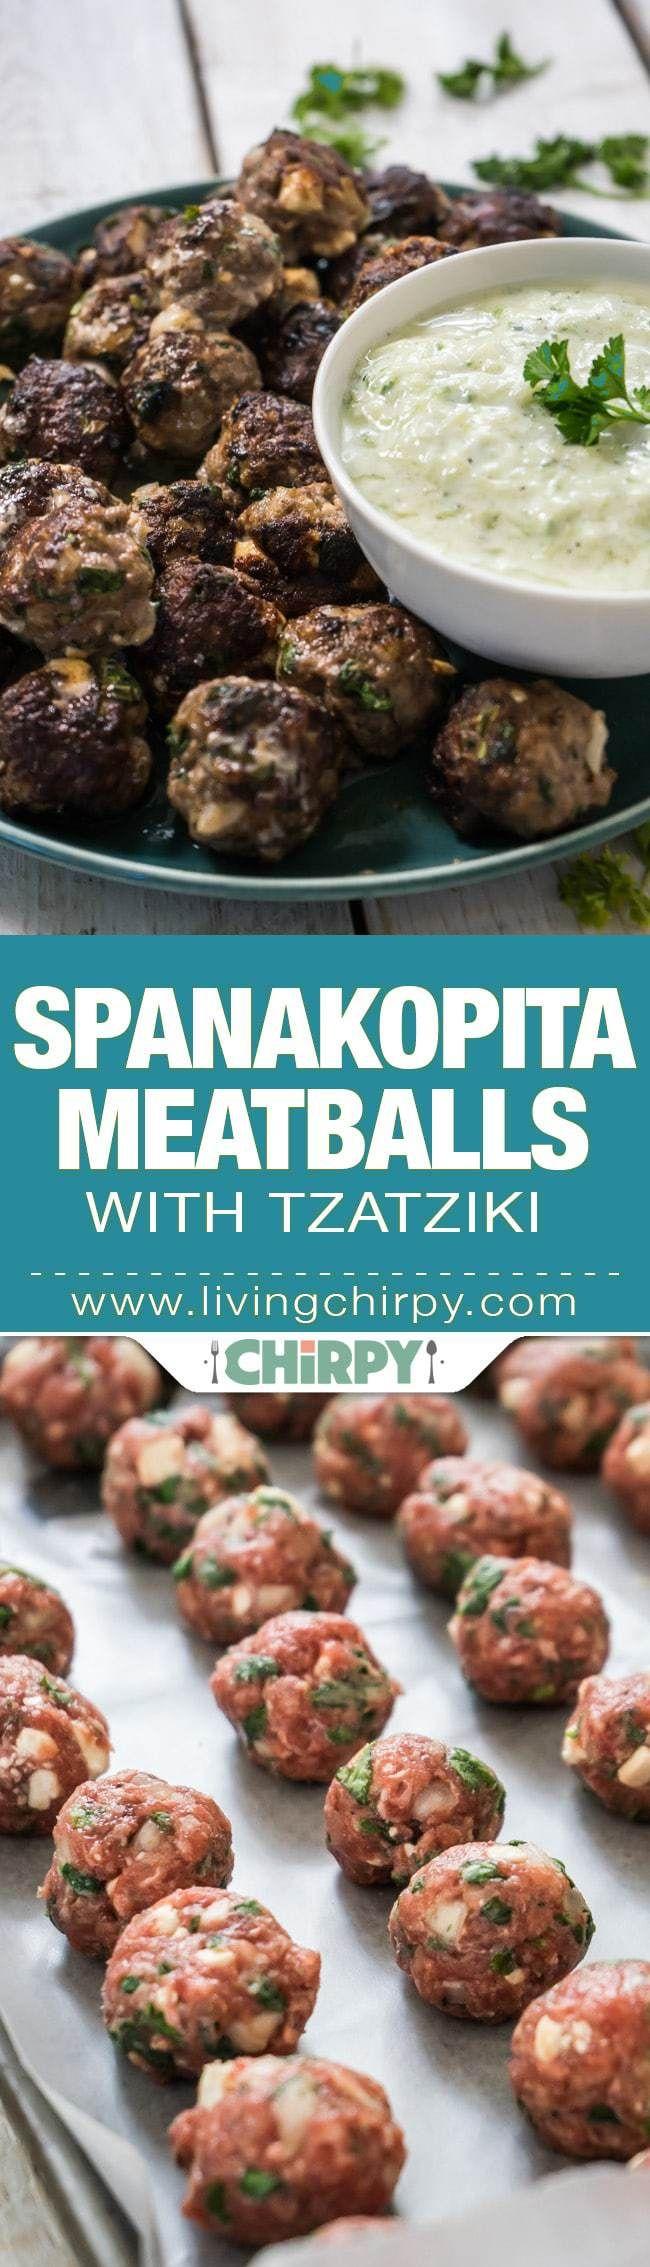 1164 best Just Greek images on Pinterest | Greek recipes, Cooking ...